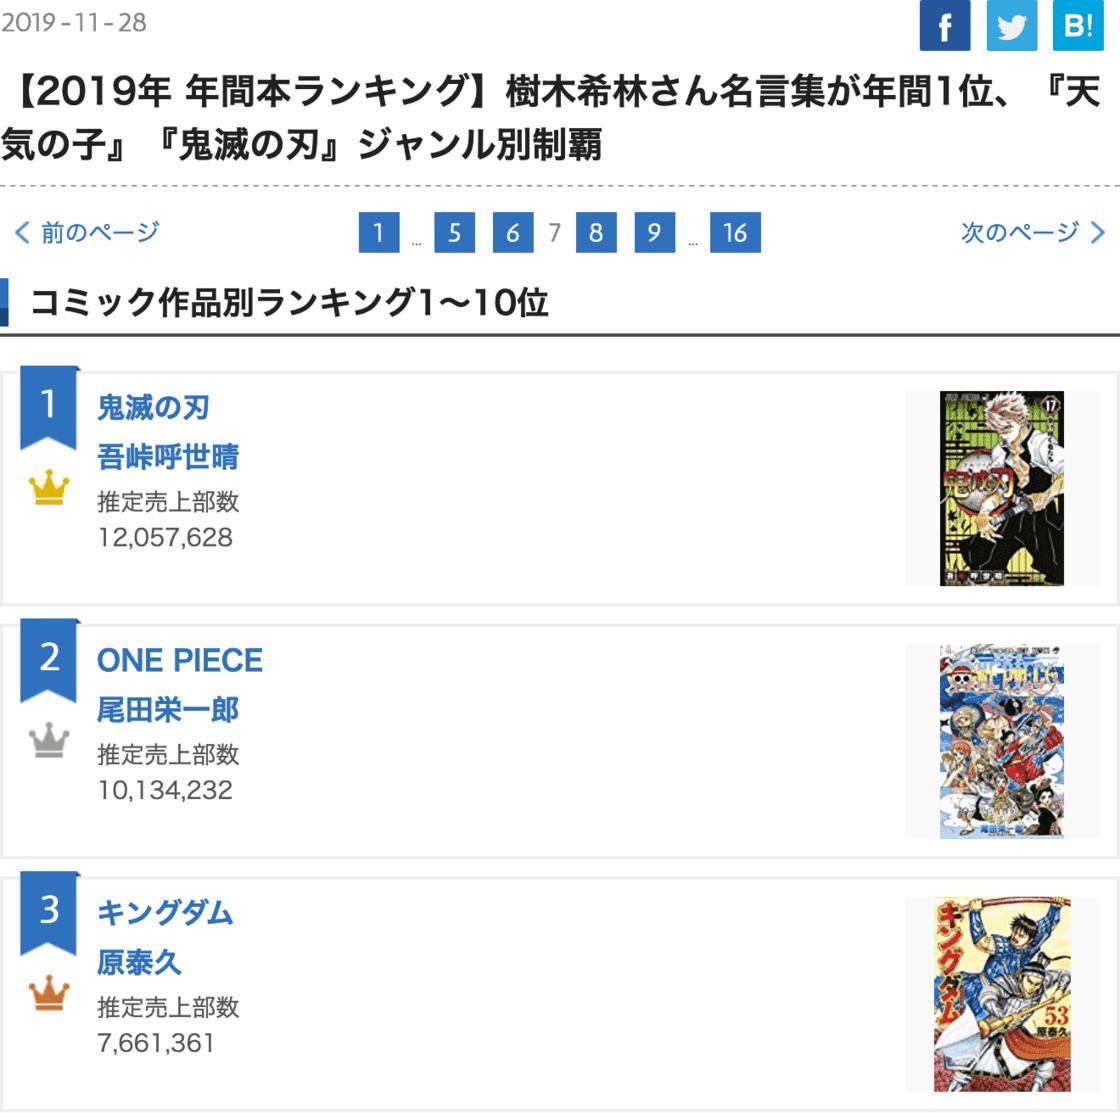 Oricon 2019 漫画销量年榜